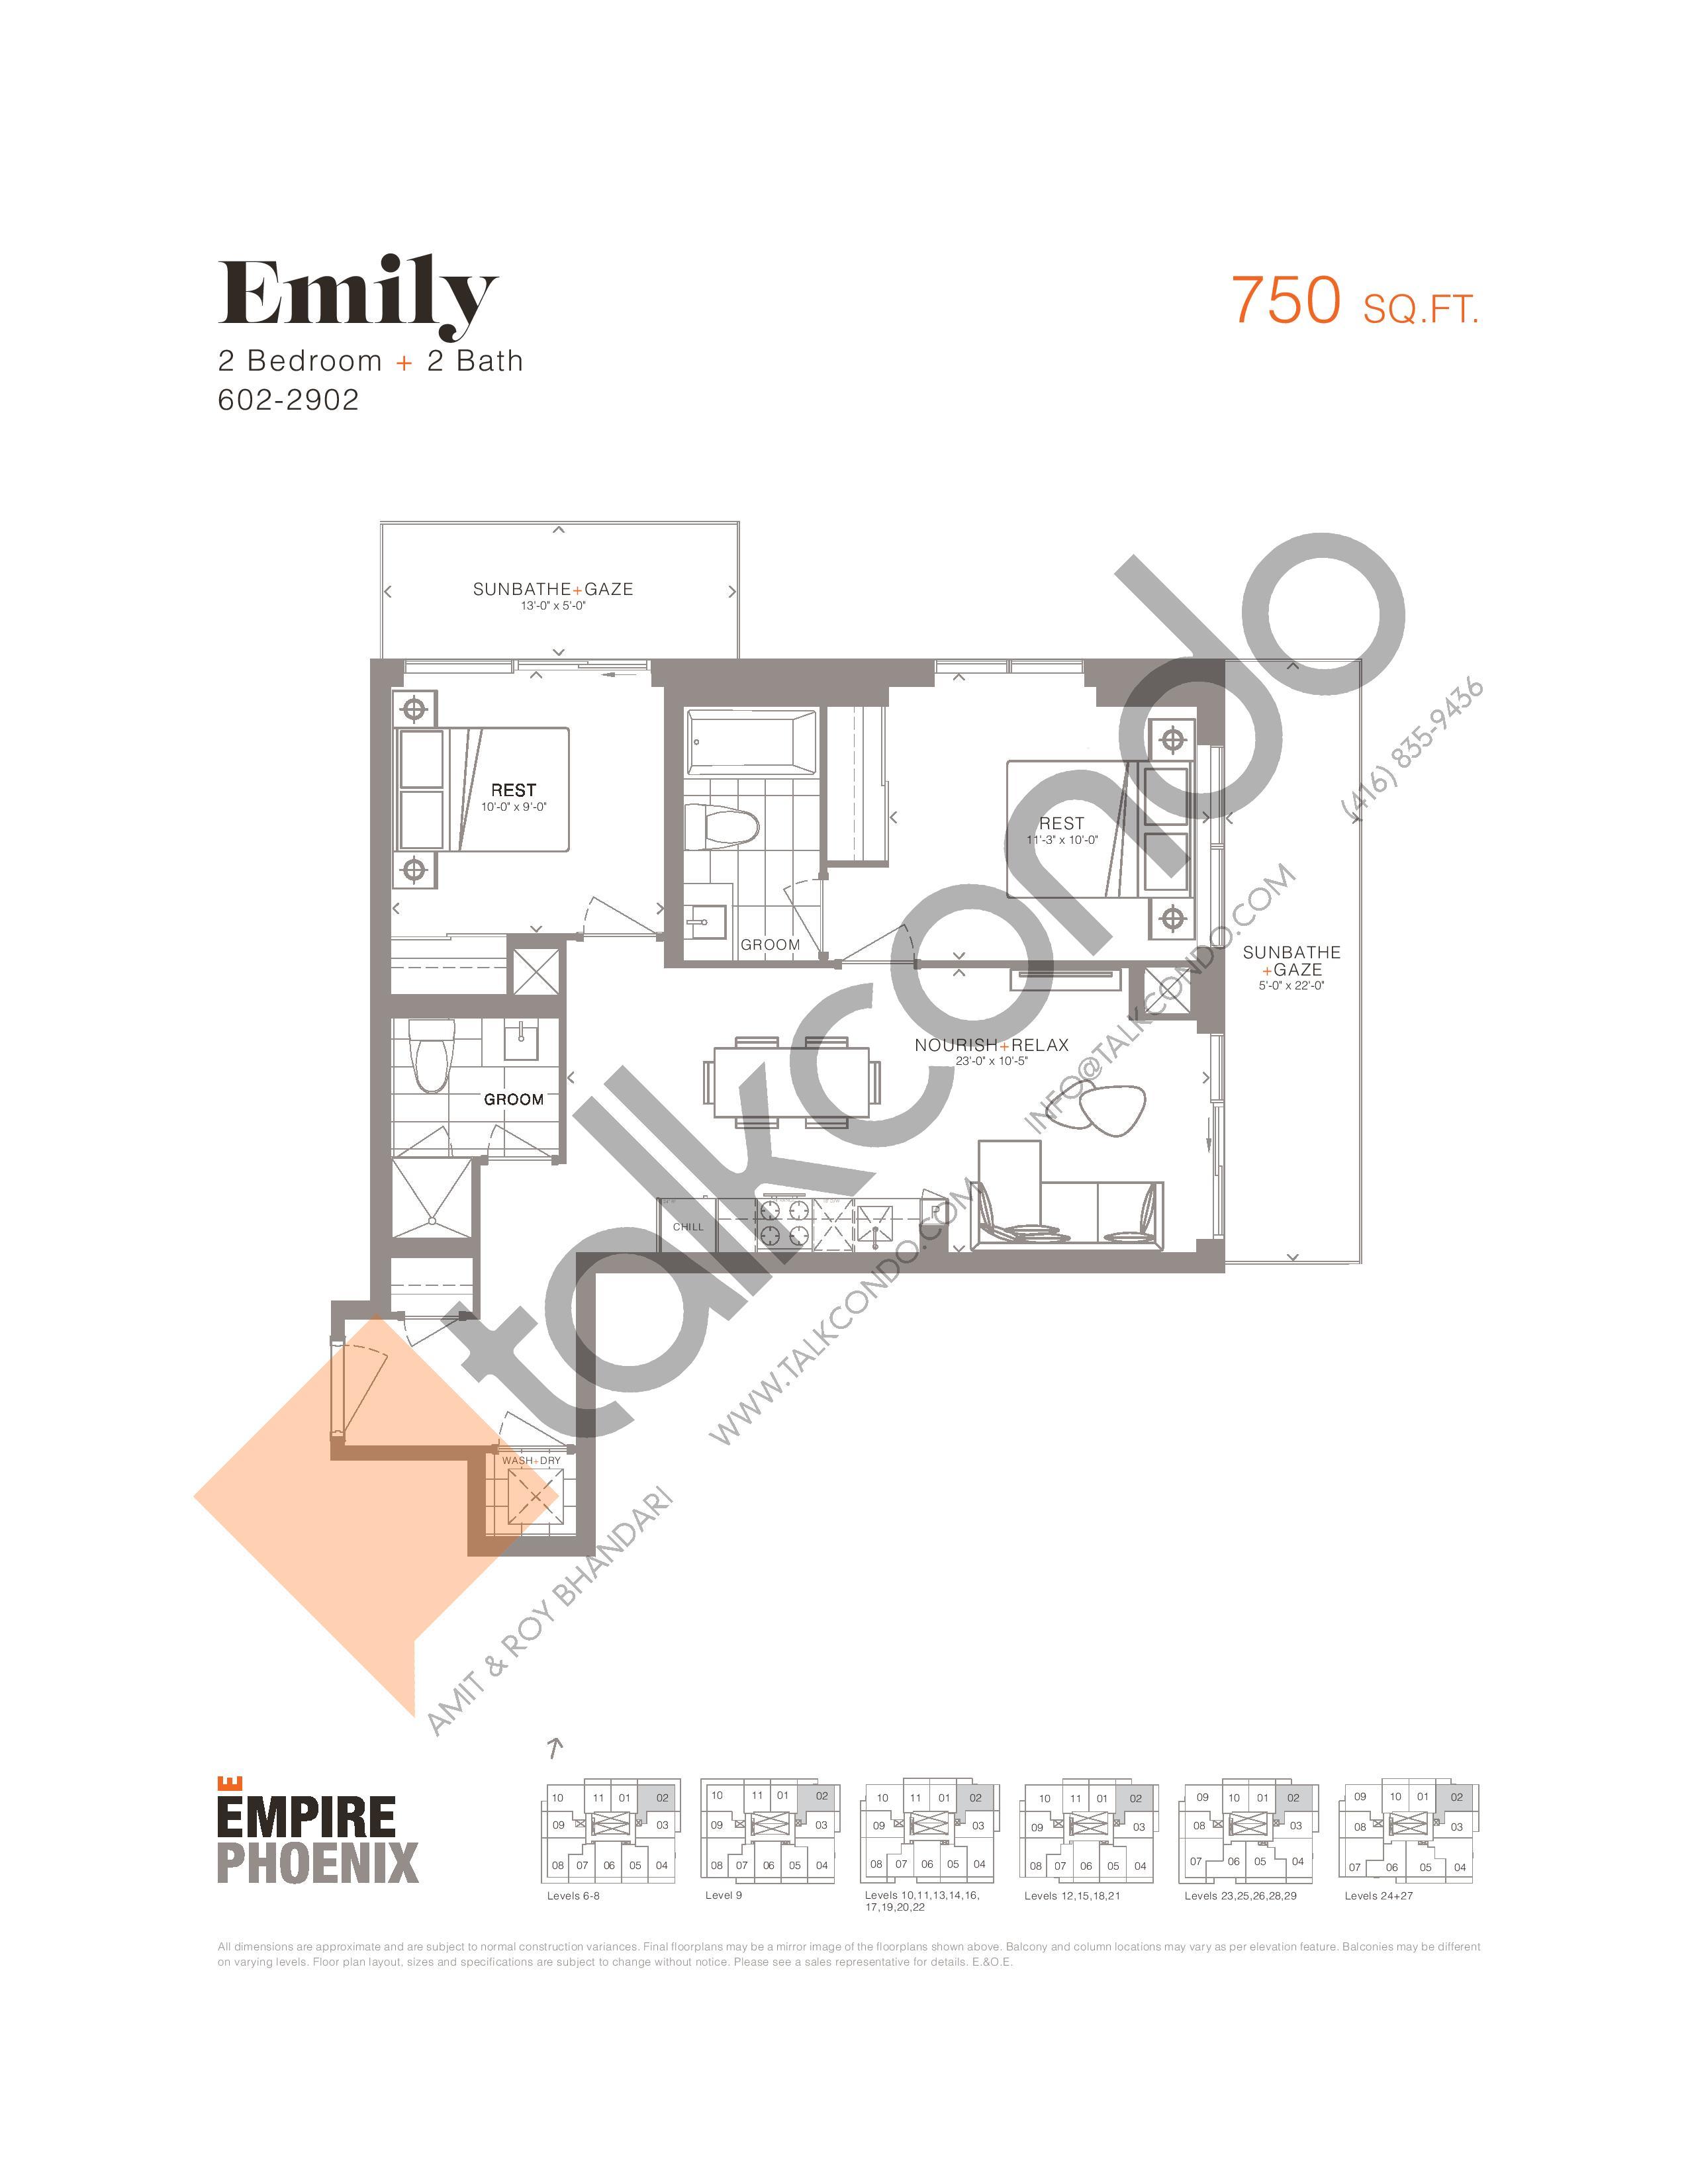 Emily Floor Plan at Empire Phoenix Phase 2 Condos - 750 sq.ft